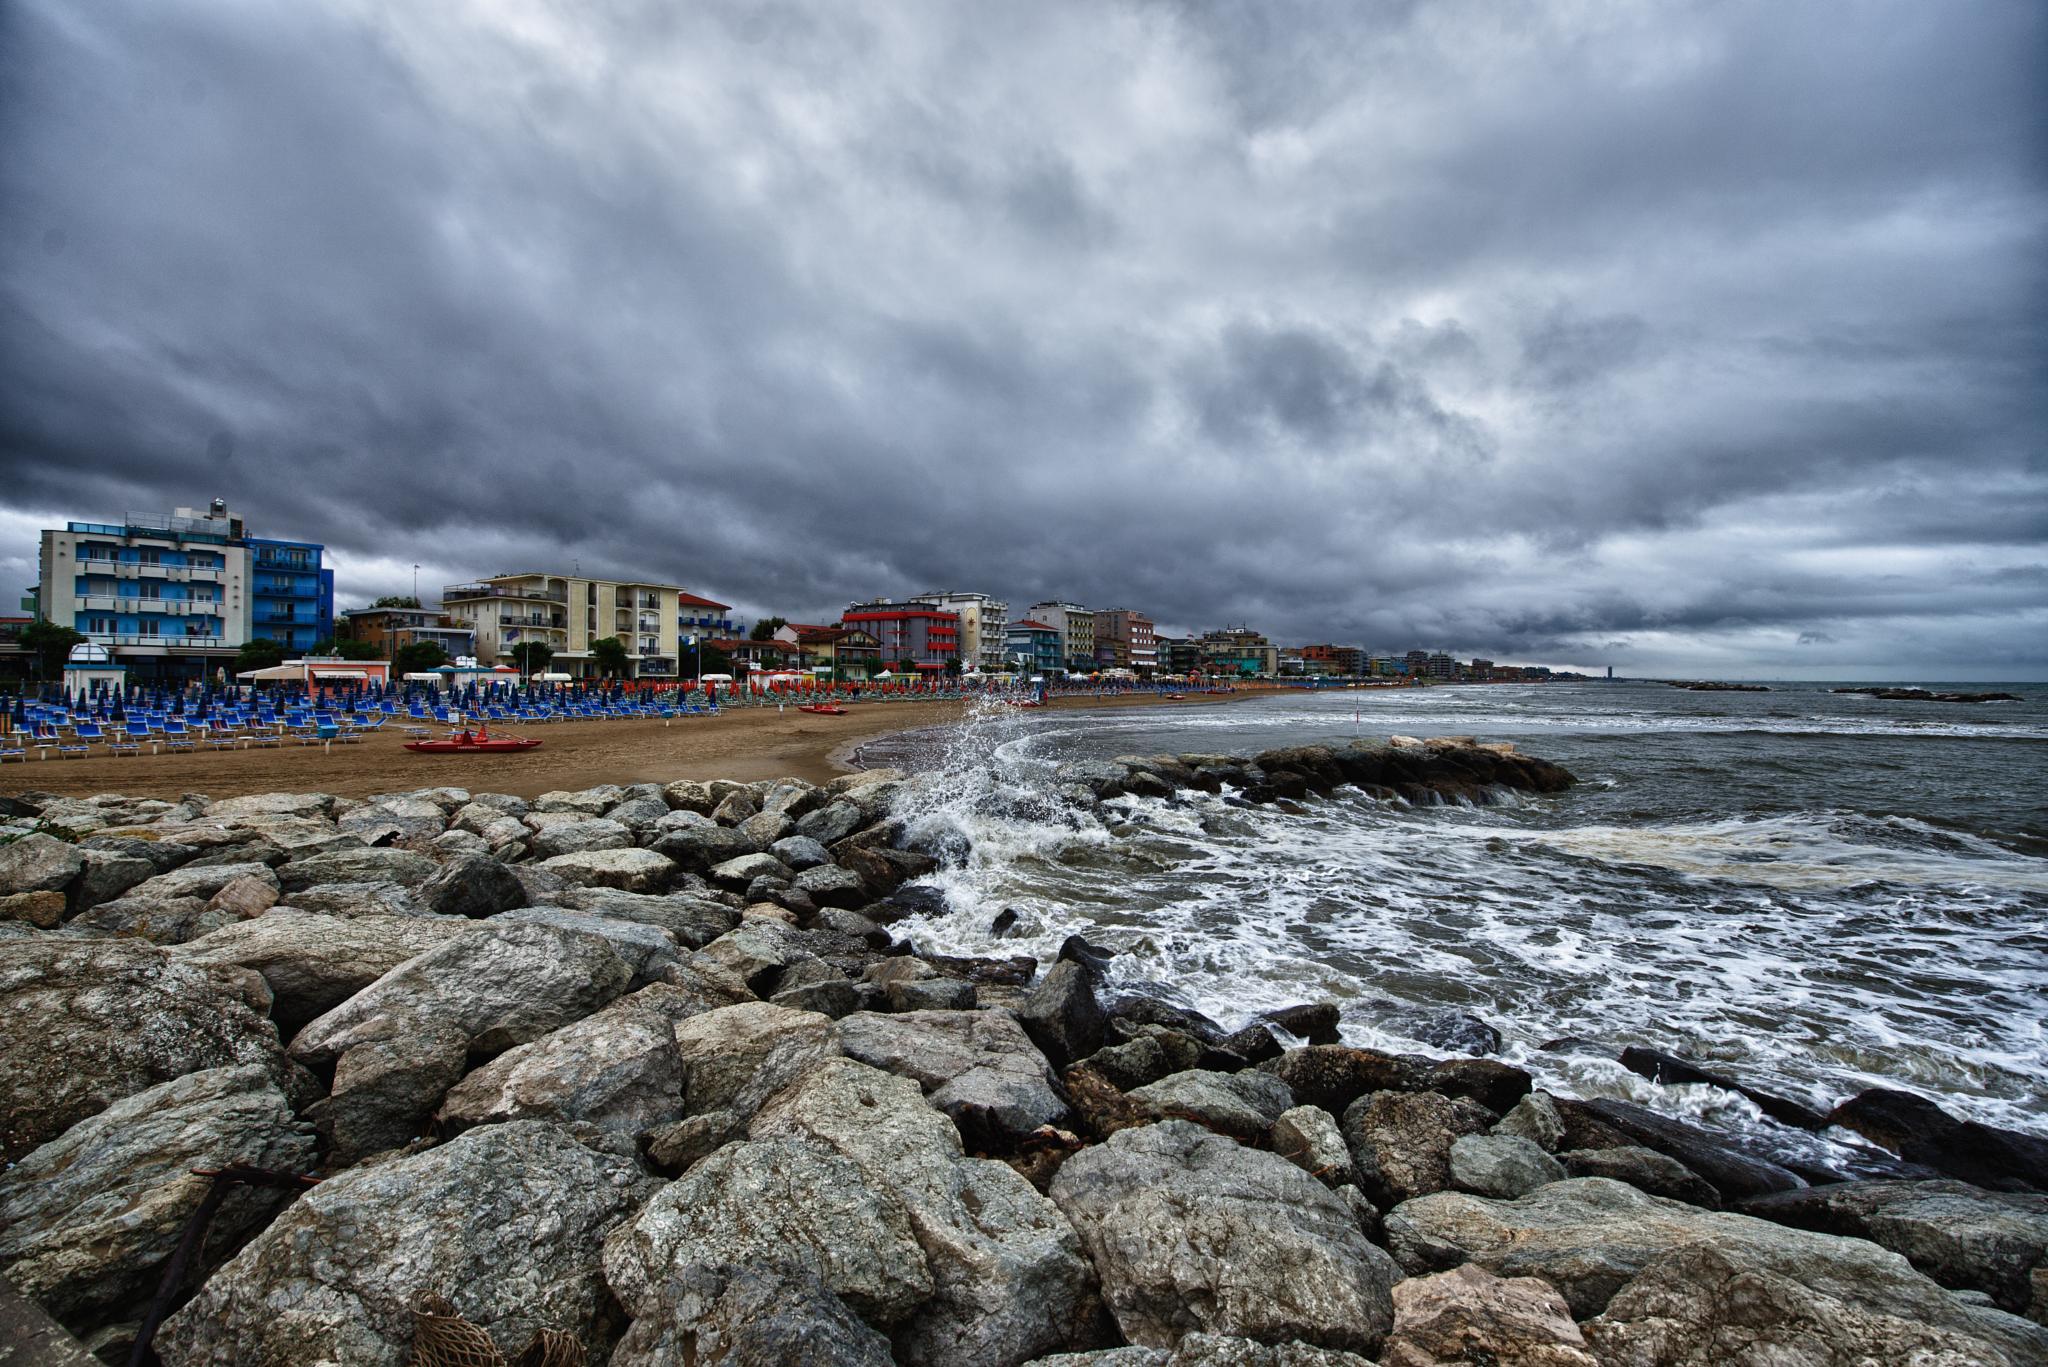 Sea by roncarolo.piero